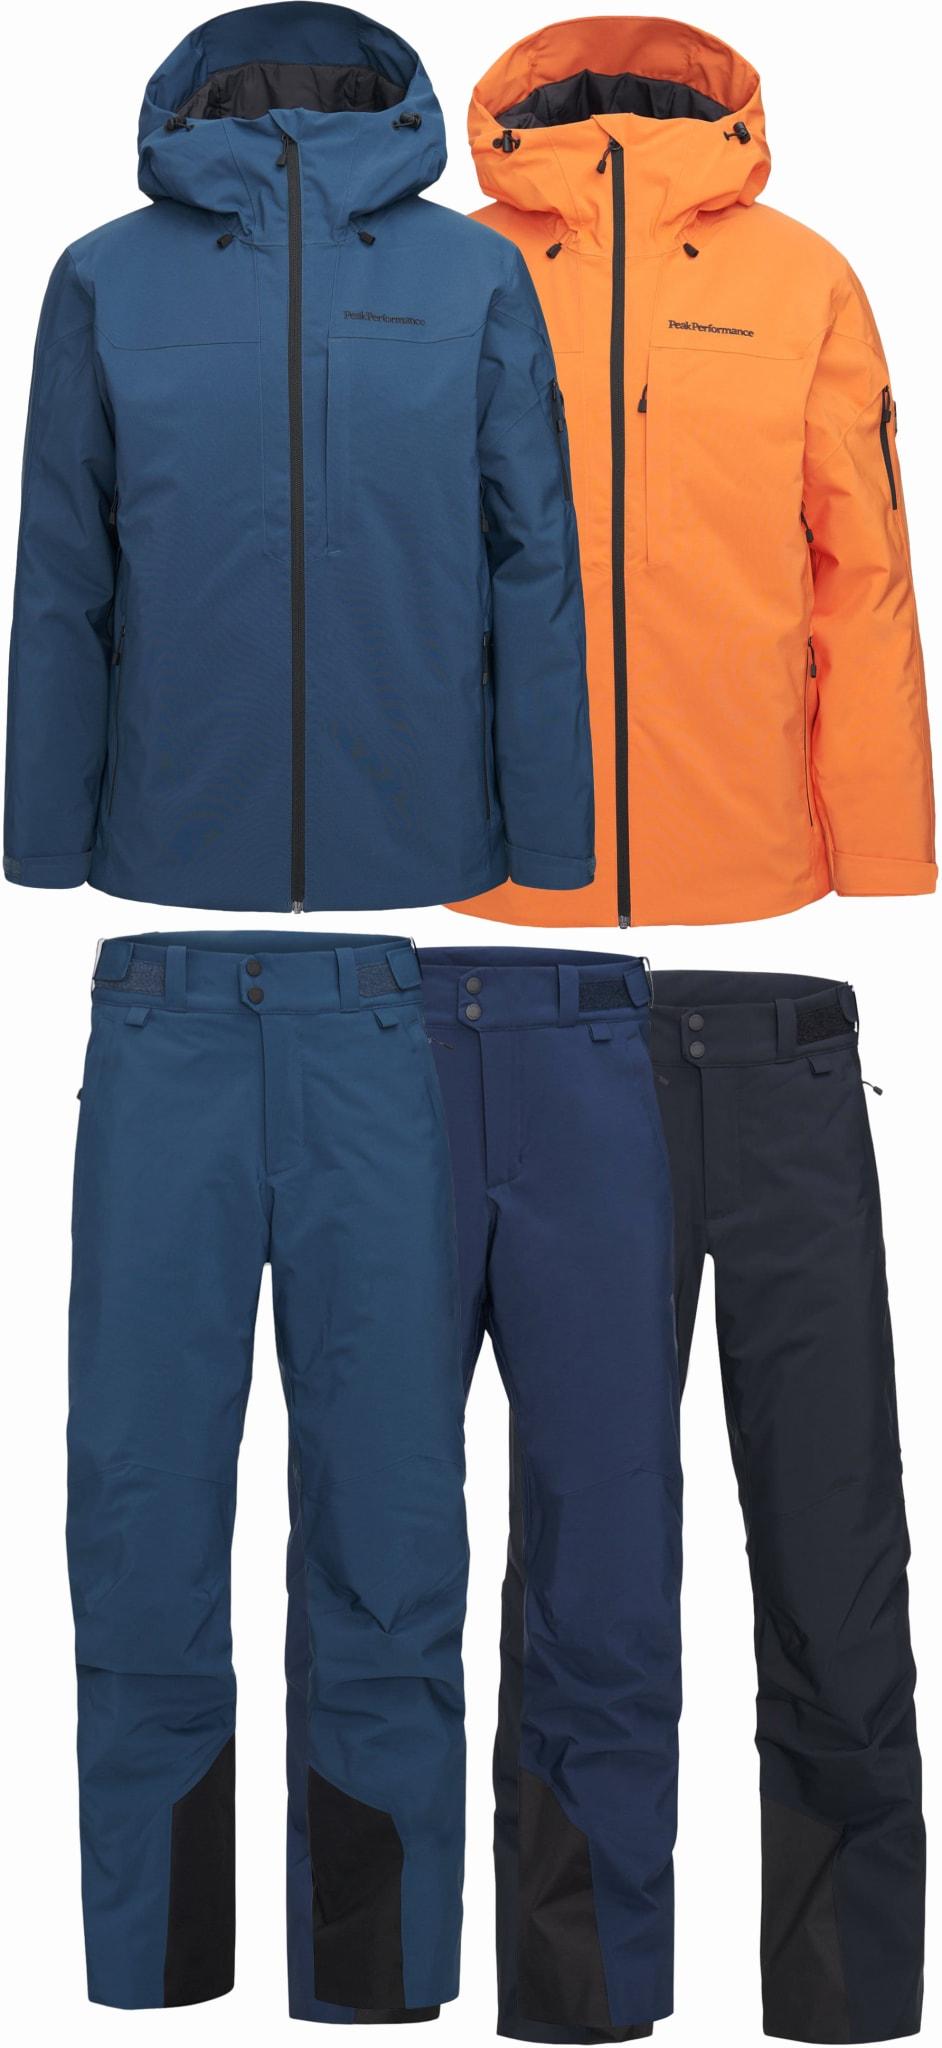 Maroon Jacket + Pant